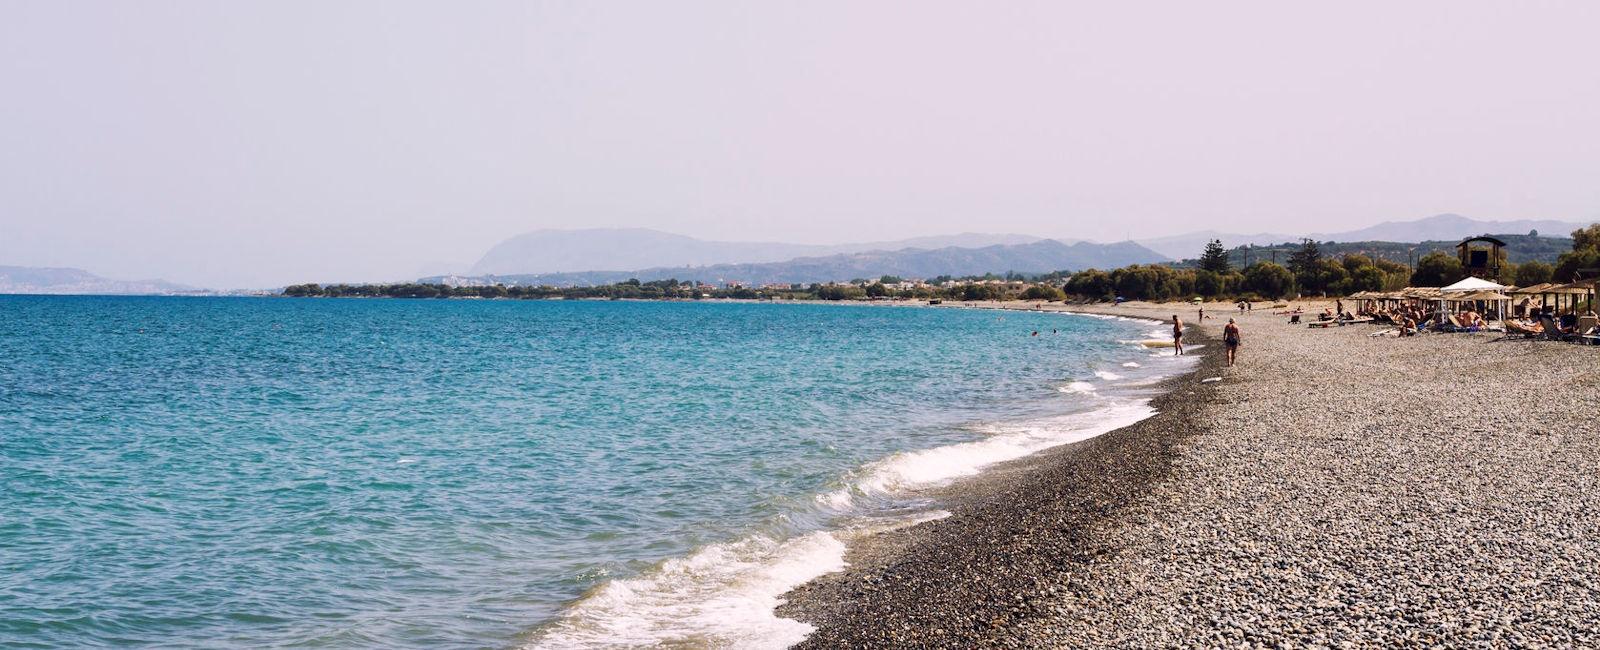 kolymbari, crete